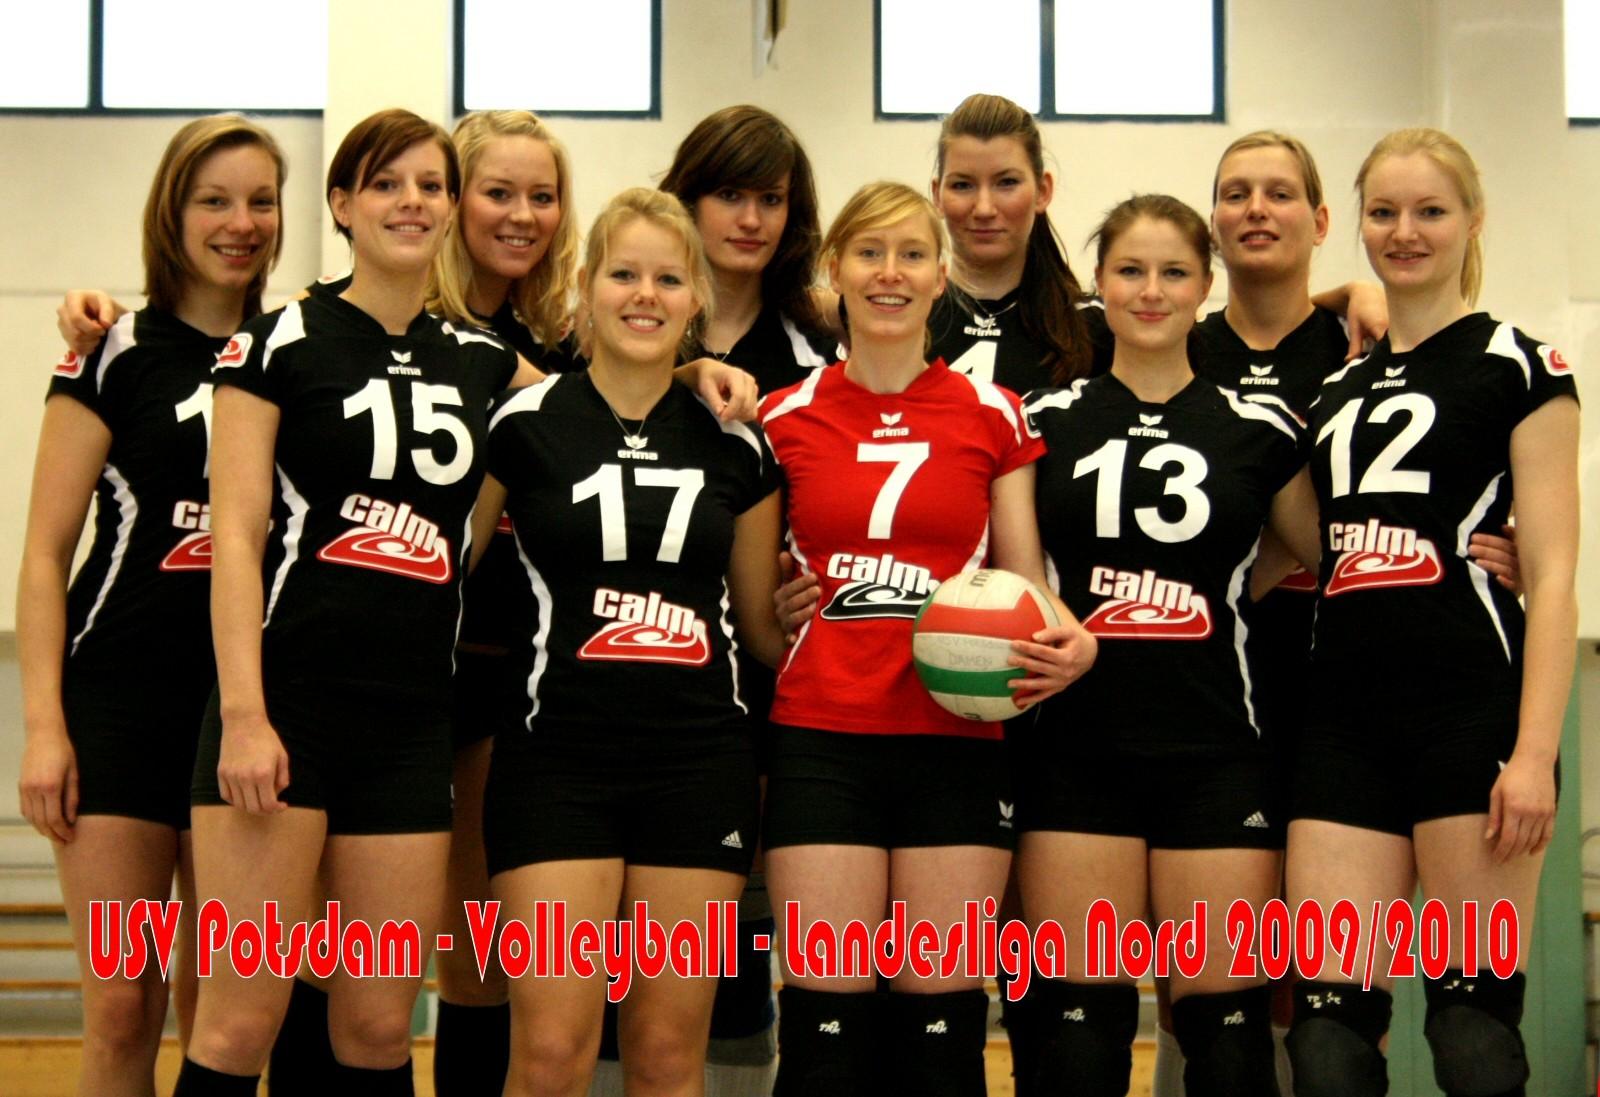 Landesliga Nord 2009/2010